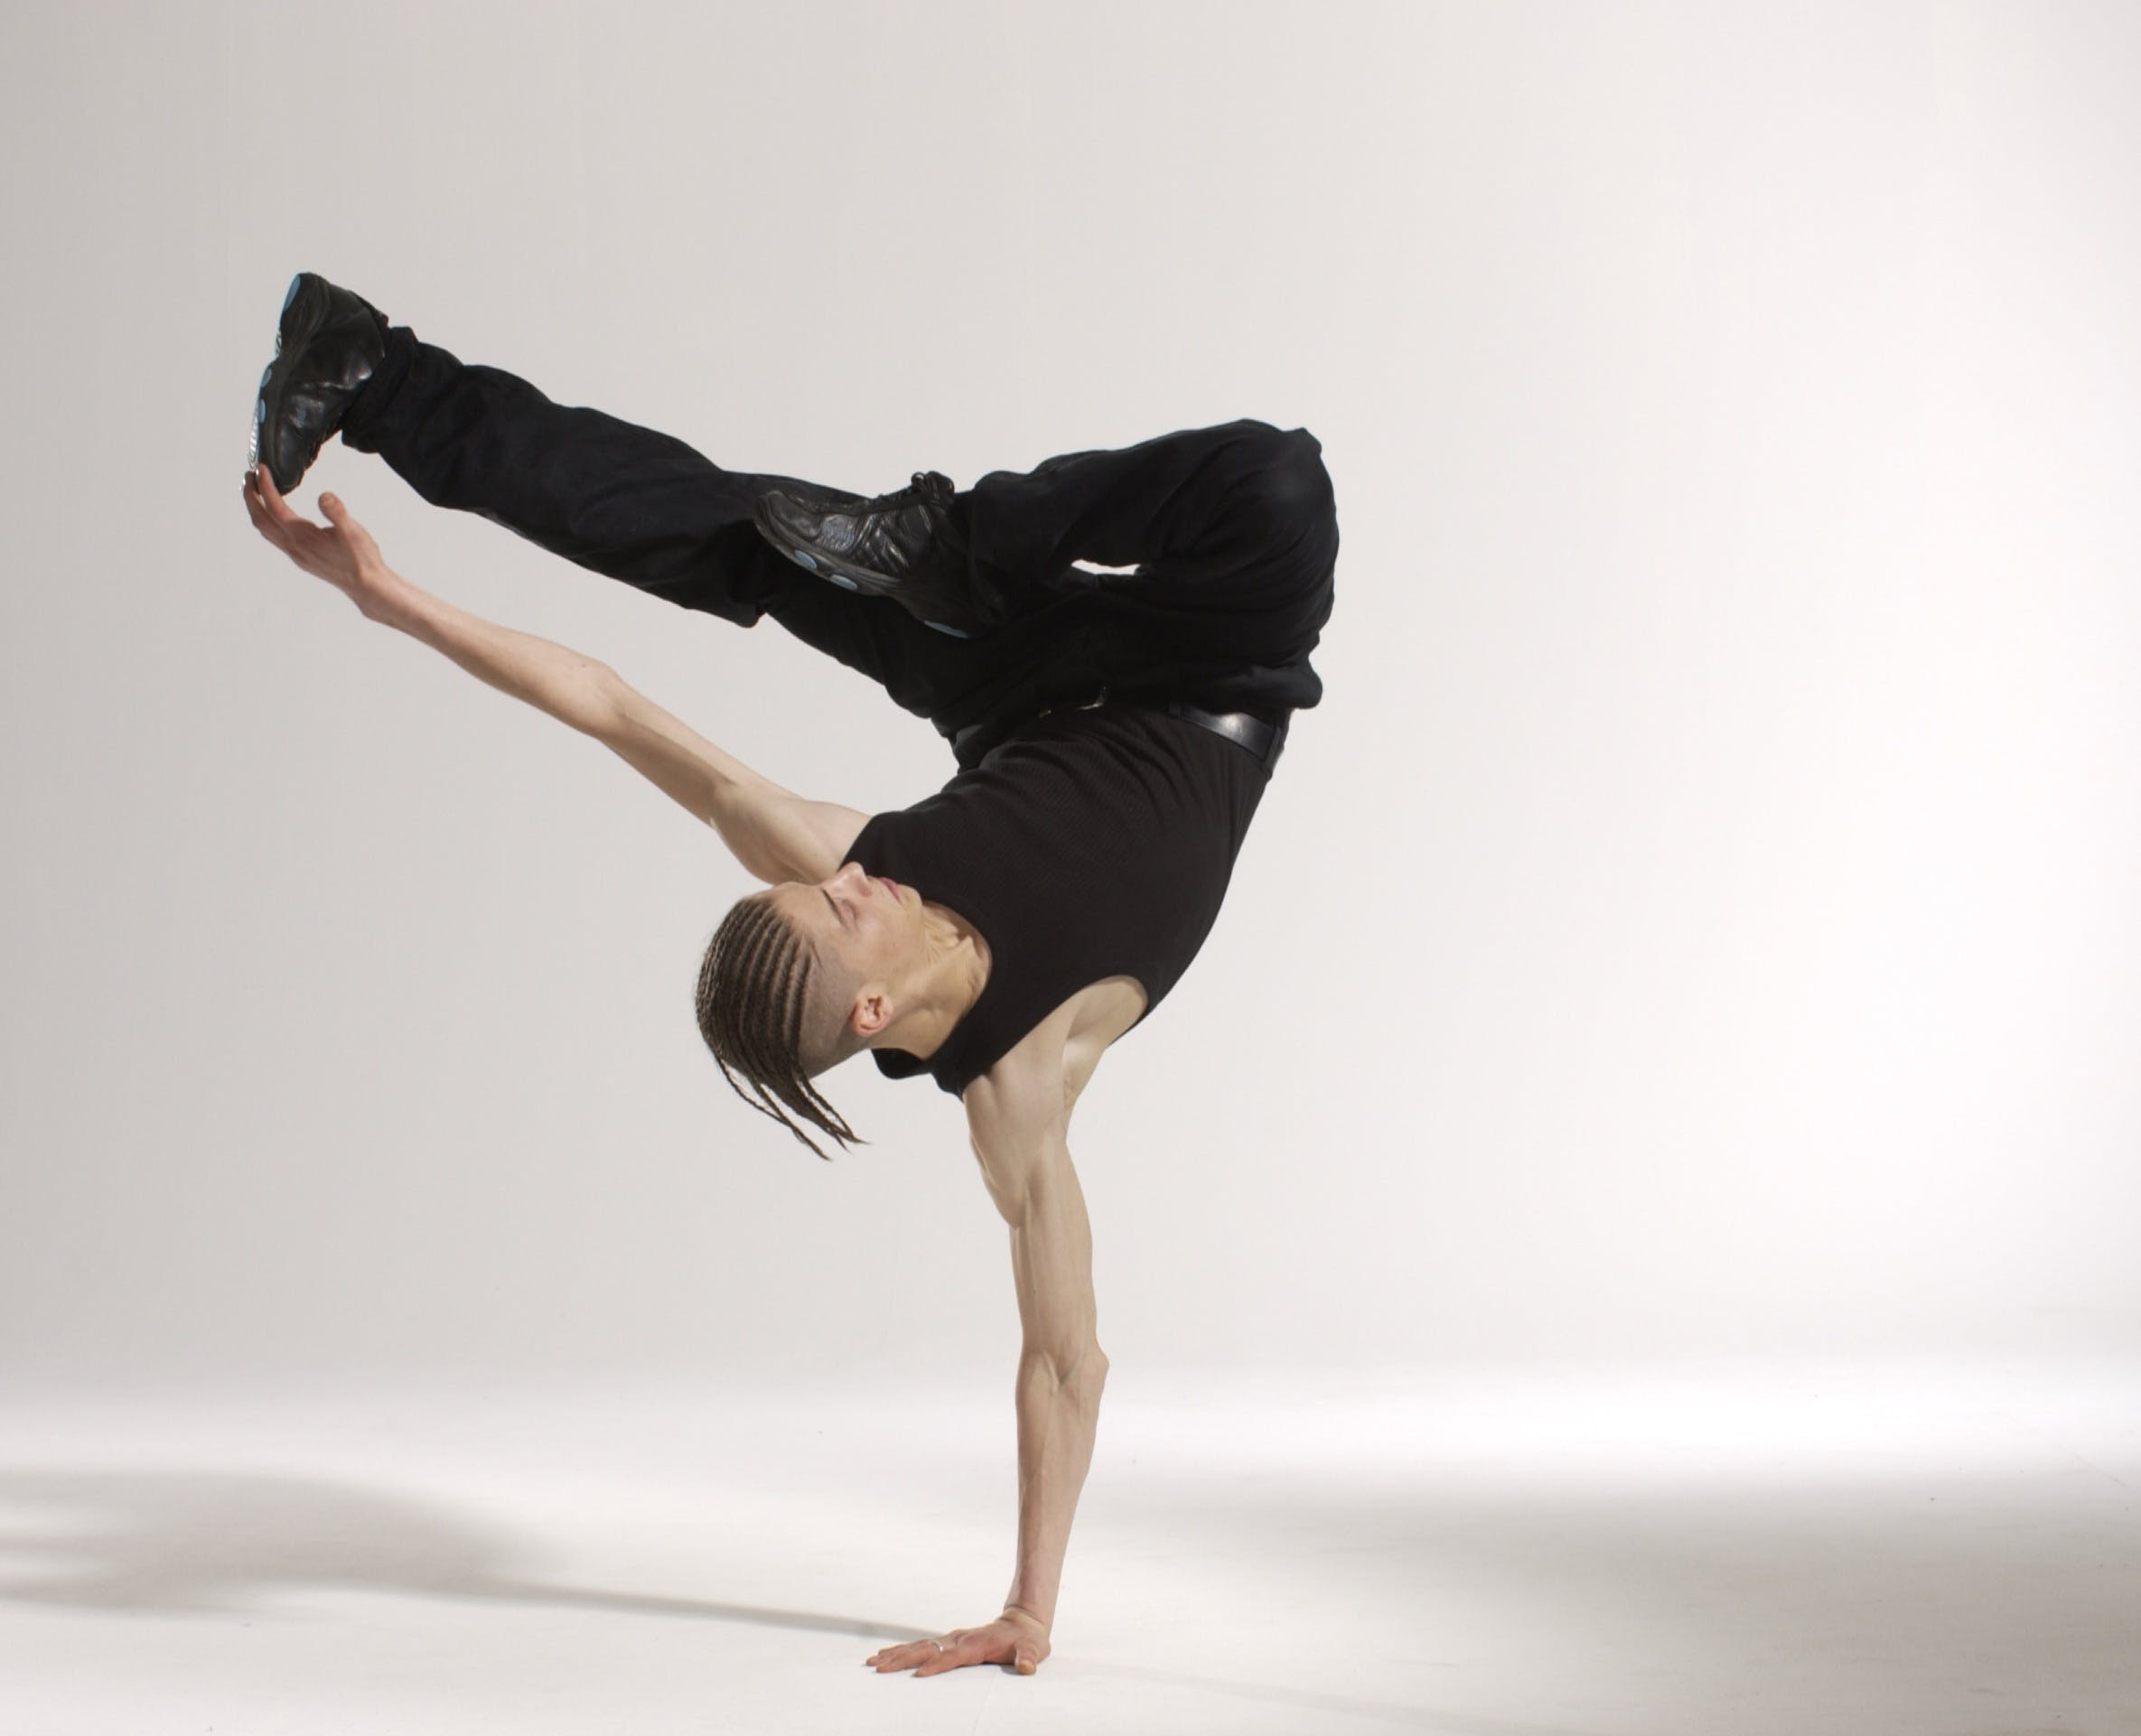 acrobat, action, active